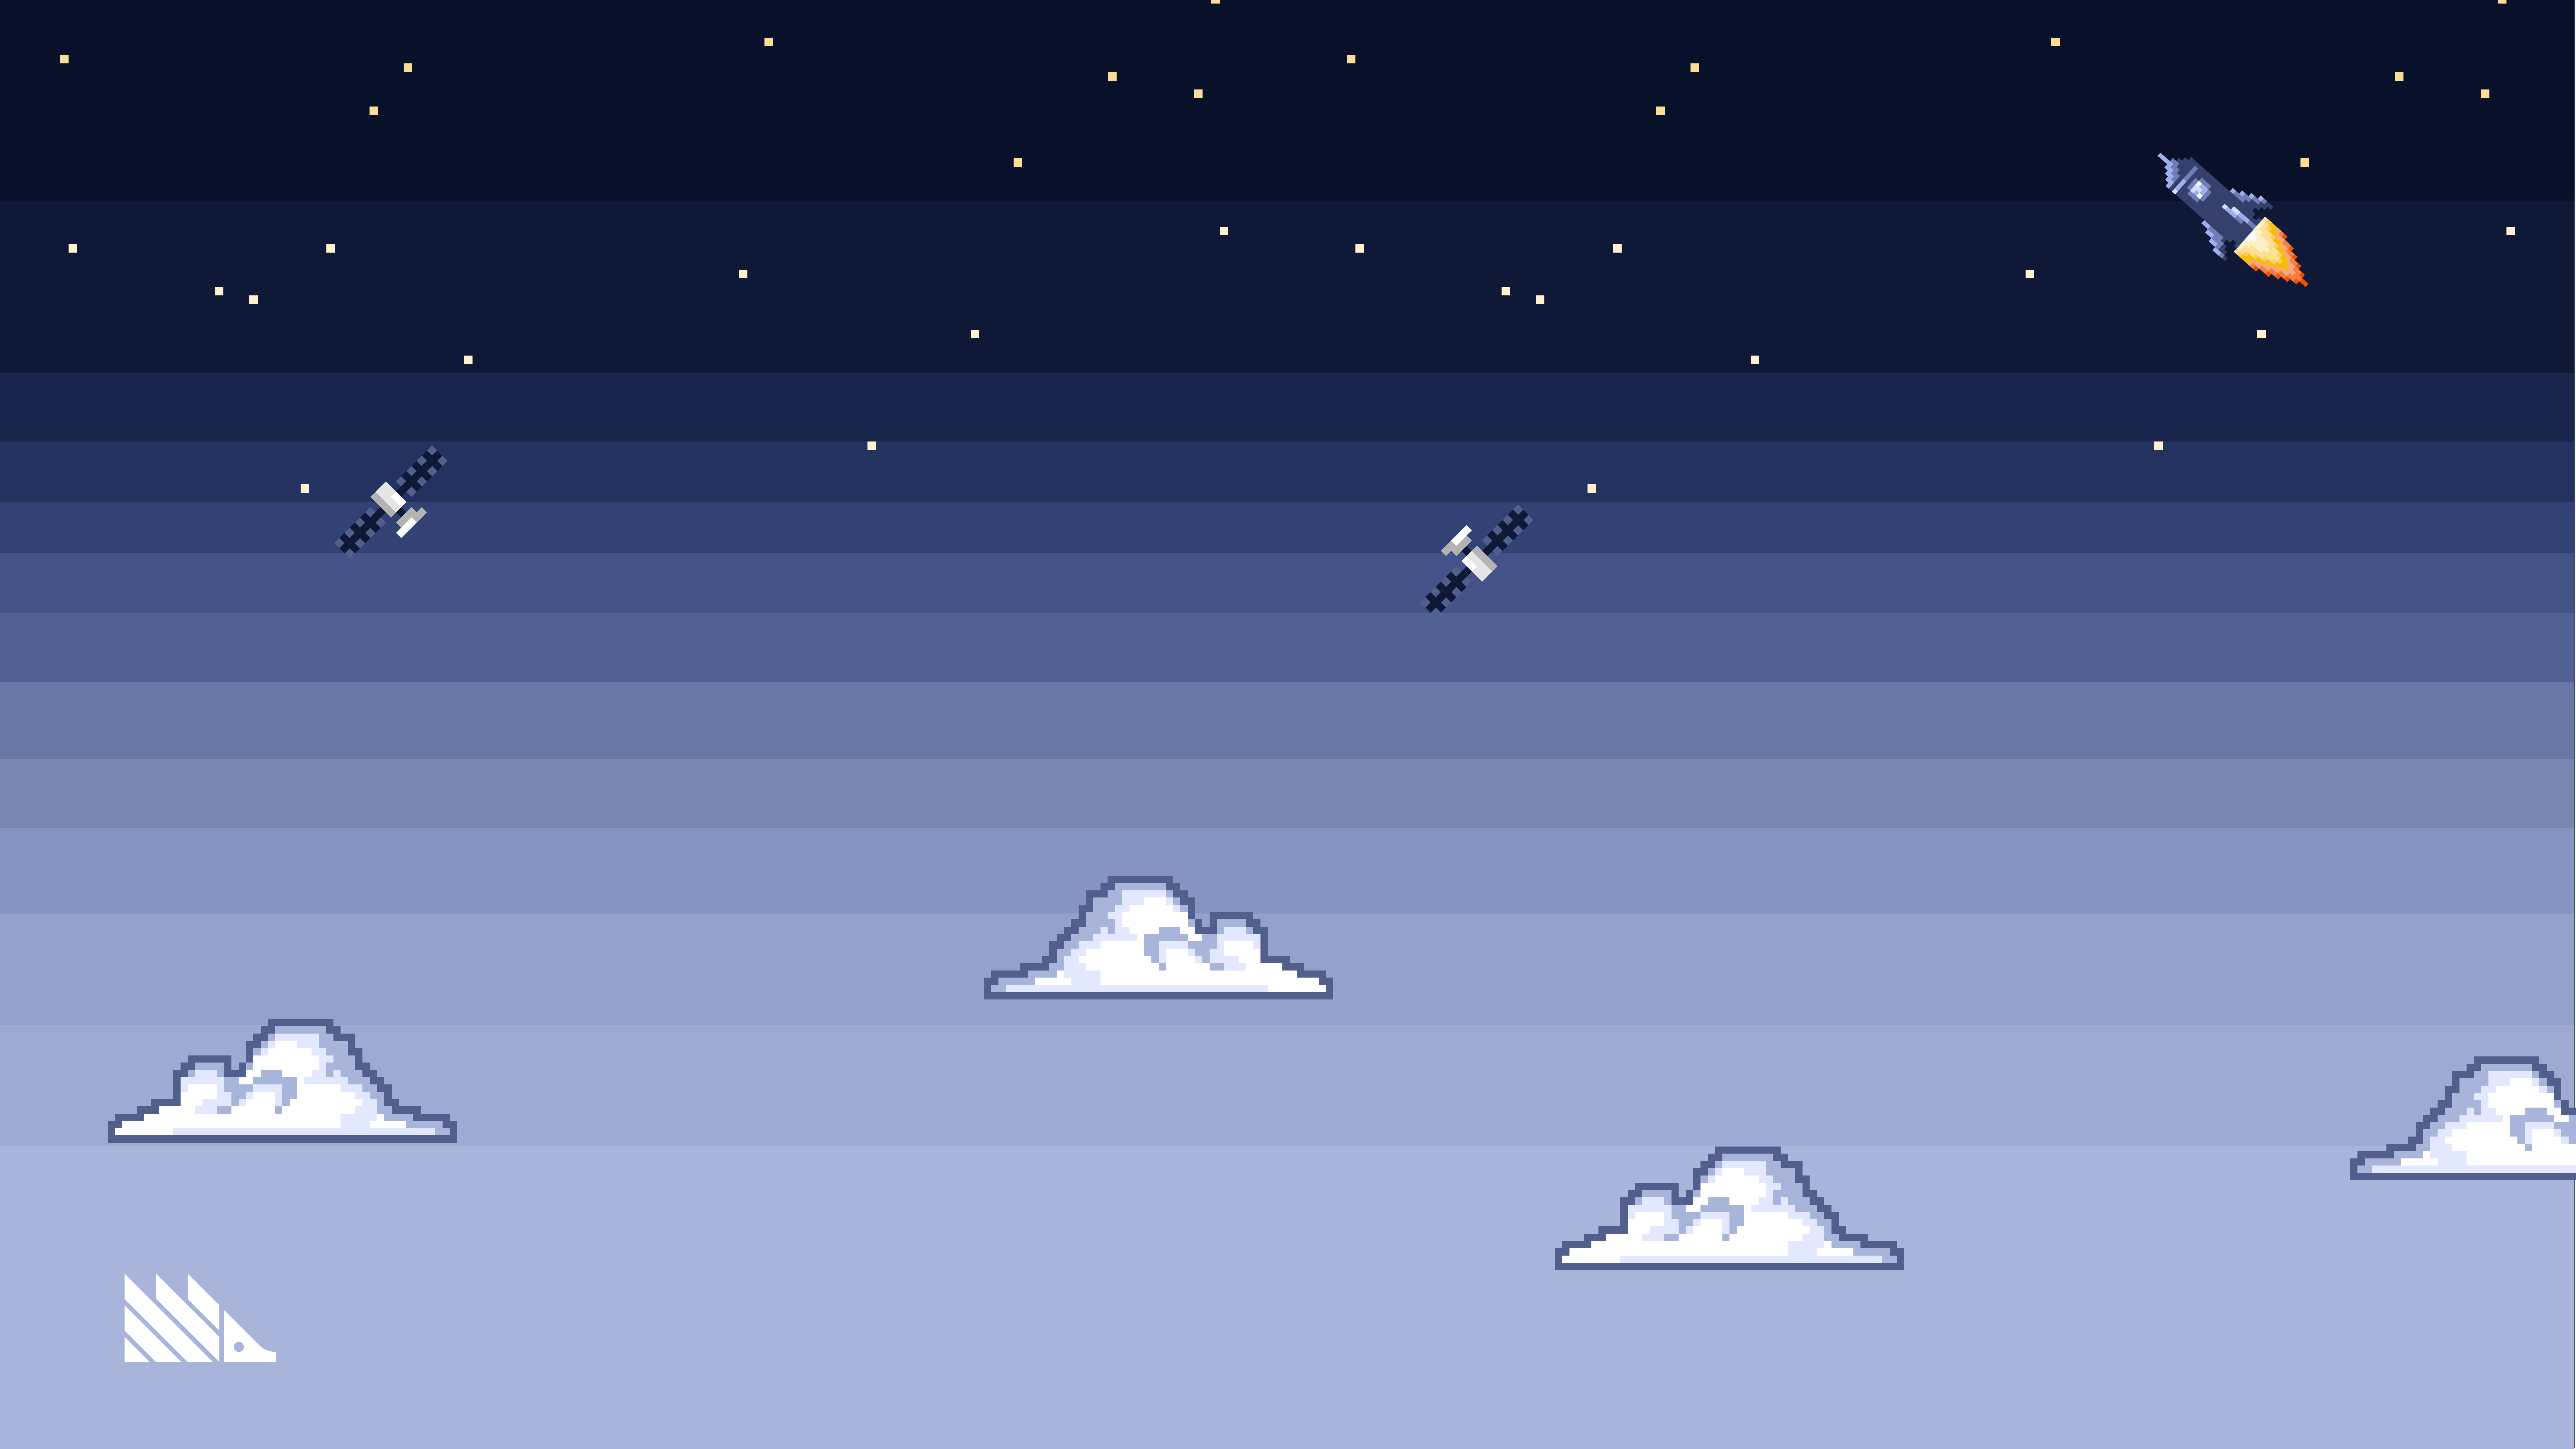 PostHog Background - sky